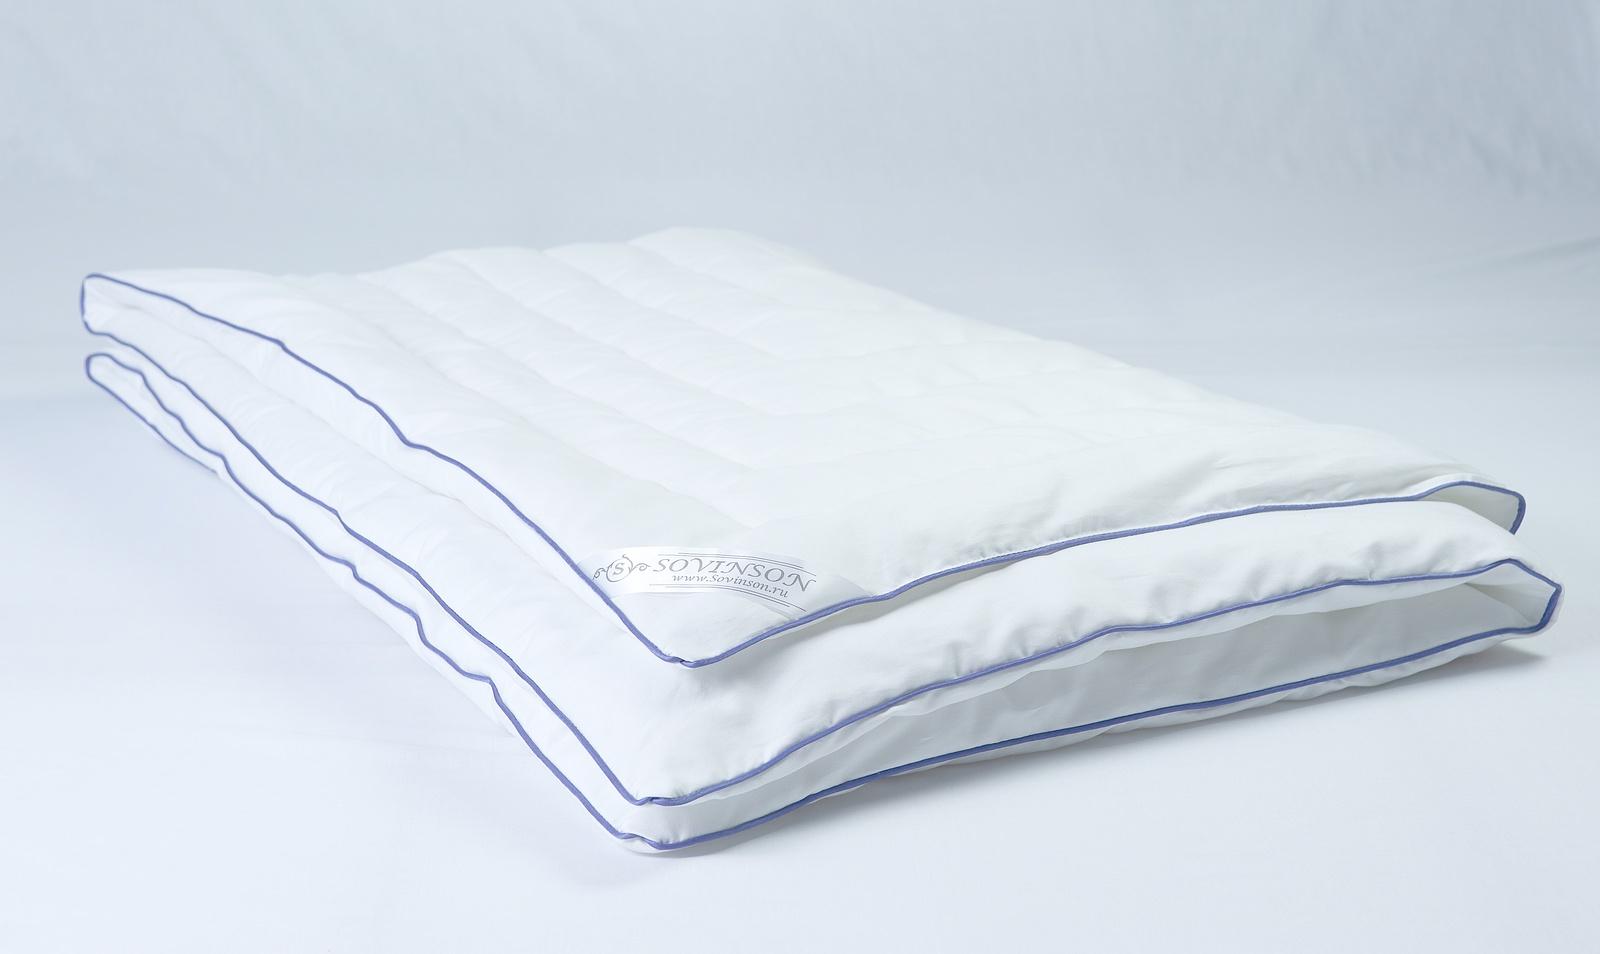 Одеяло Sovinson Soft Silk, белый silk place одеяло детское silk place 110х140 см шелк хлопок 650 г белый wz j7nfz